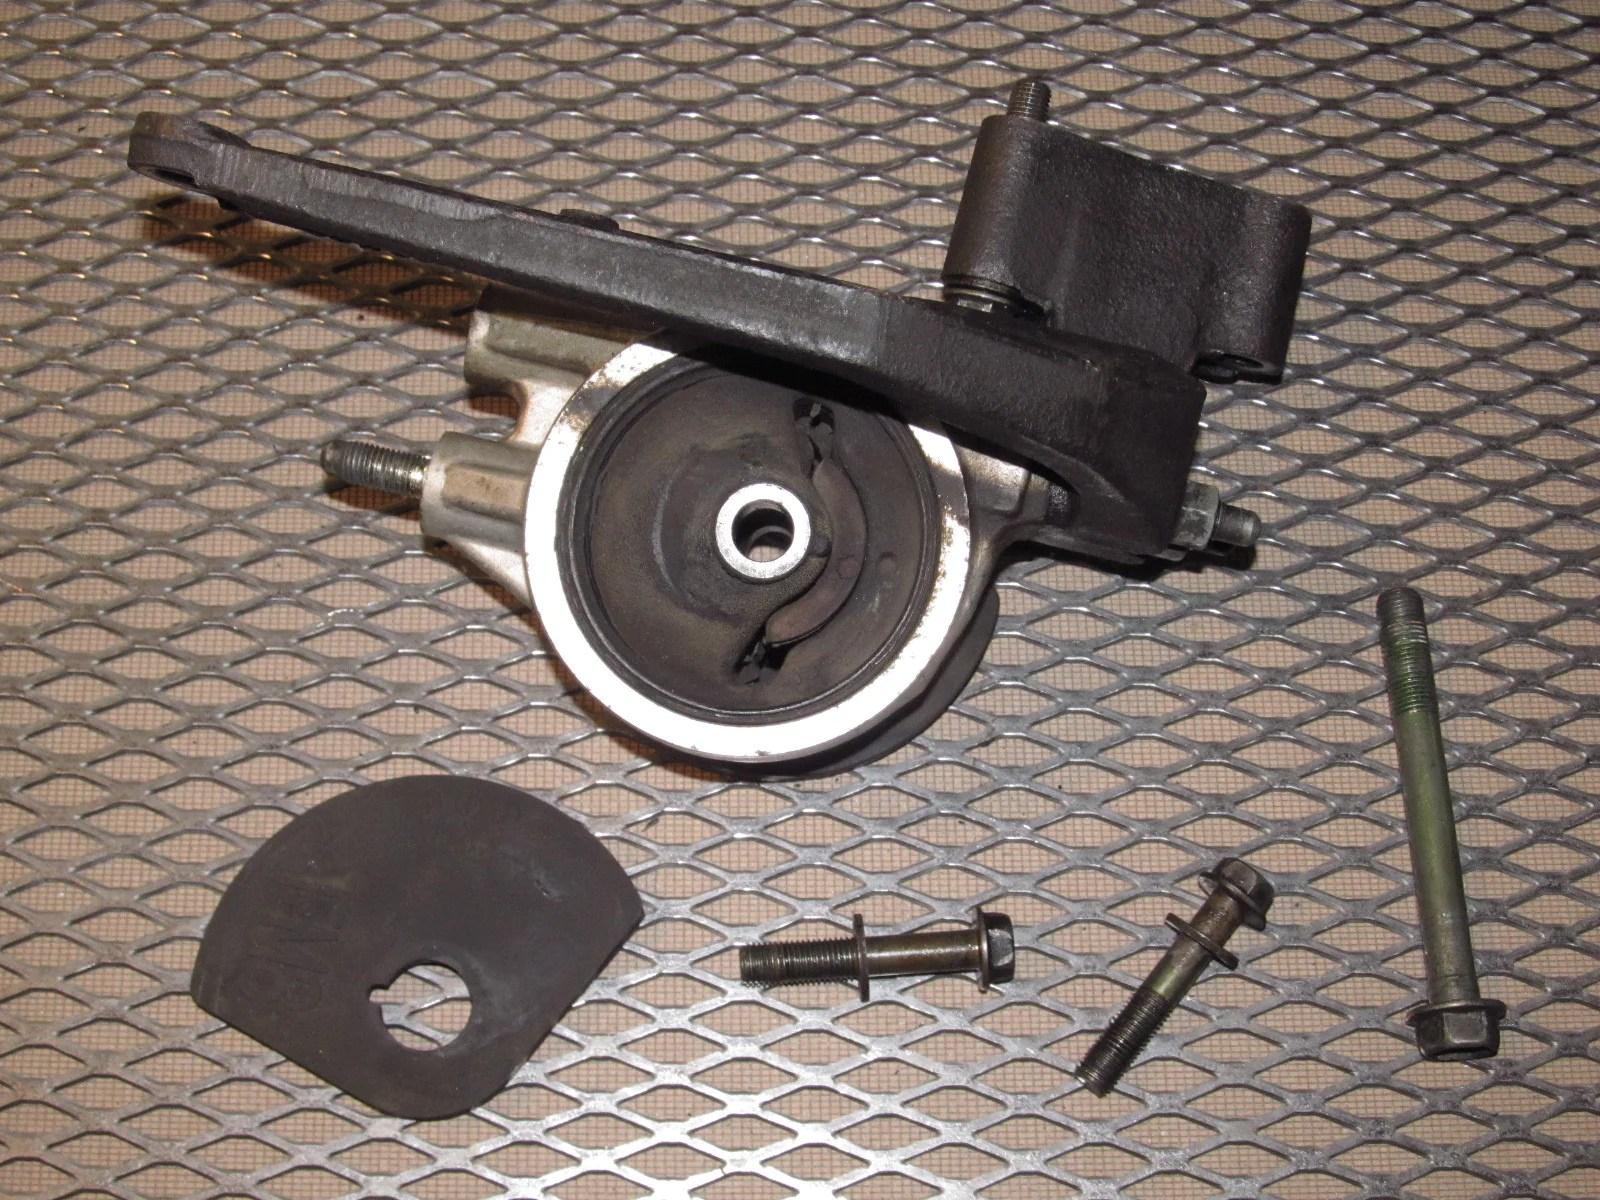 medium resolution of  91 92 93 94 95 toyota mr2 oem 2 2l engine motor mount bracket